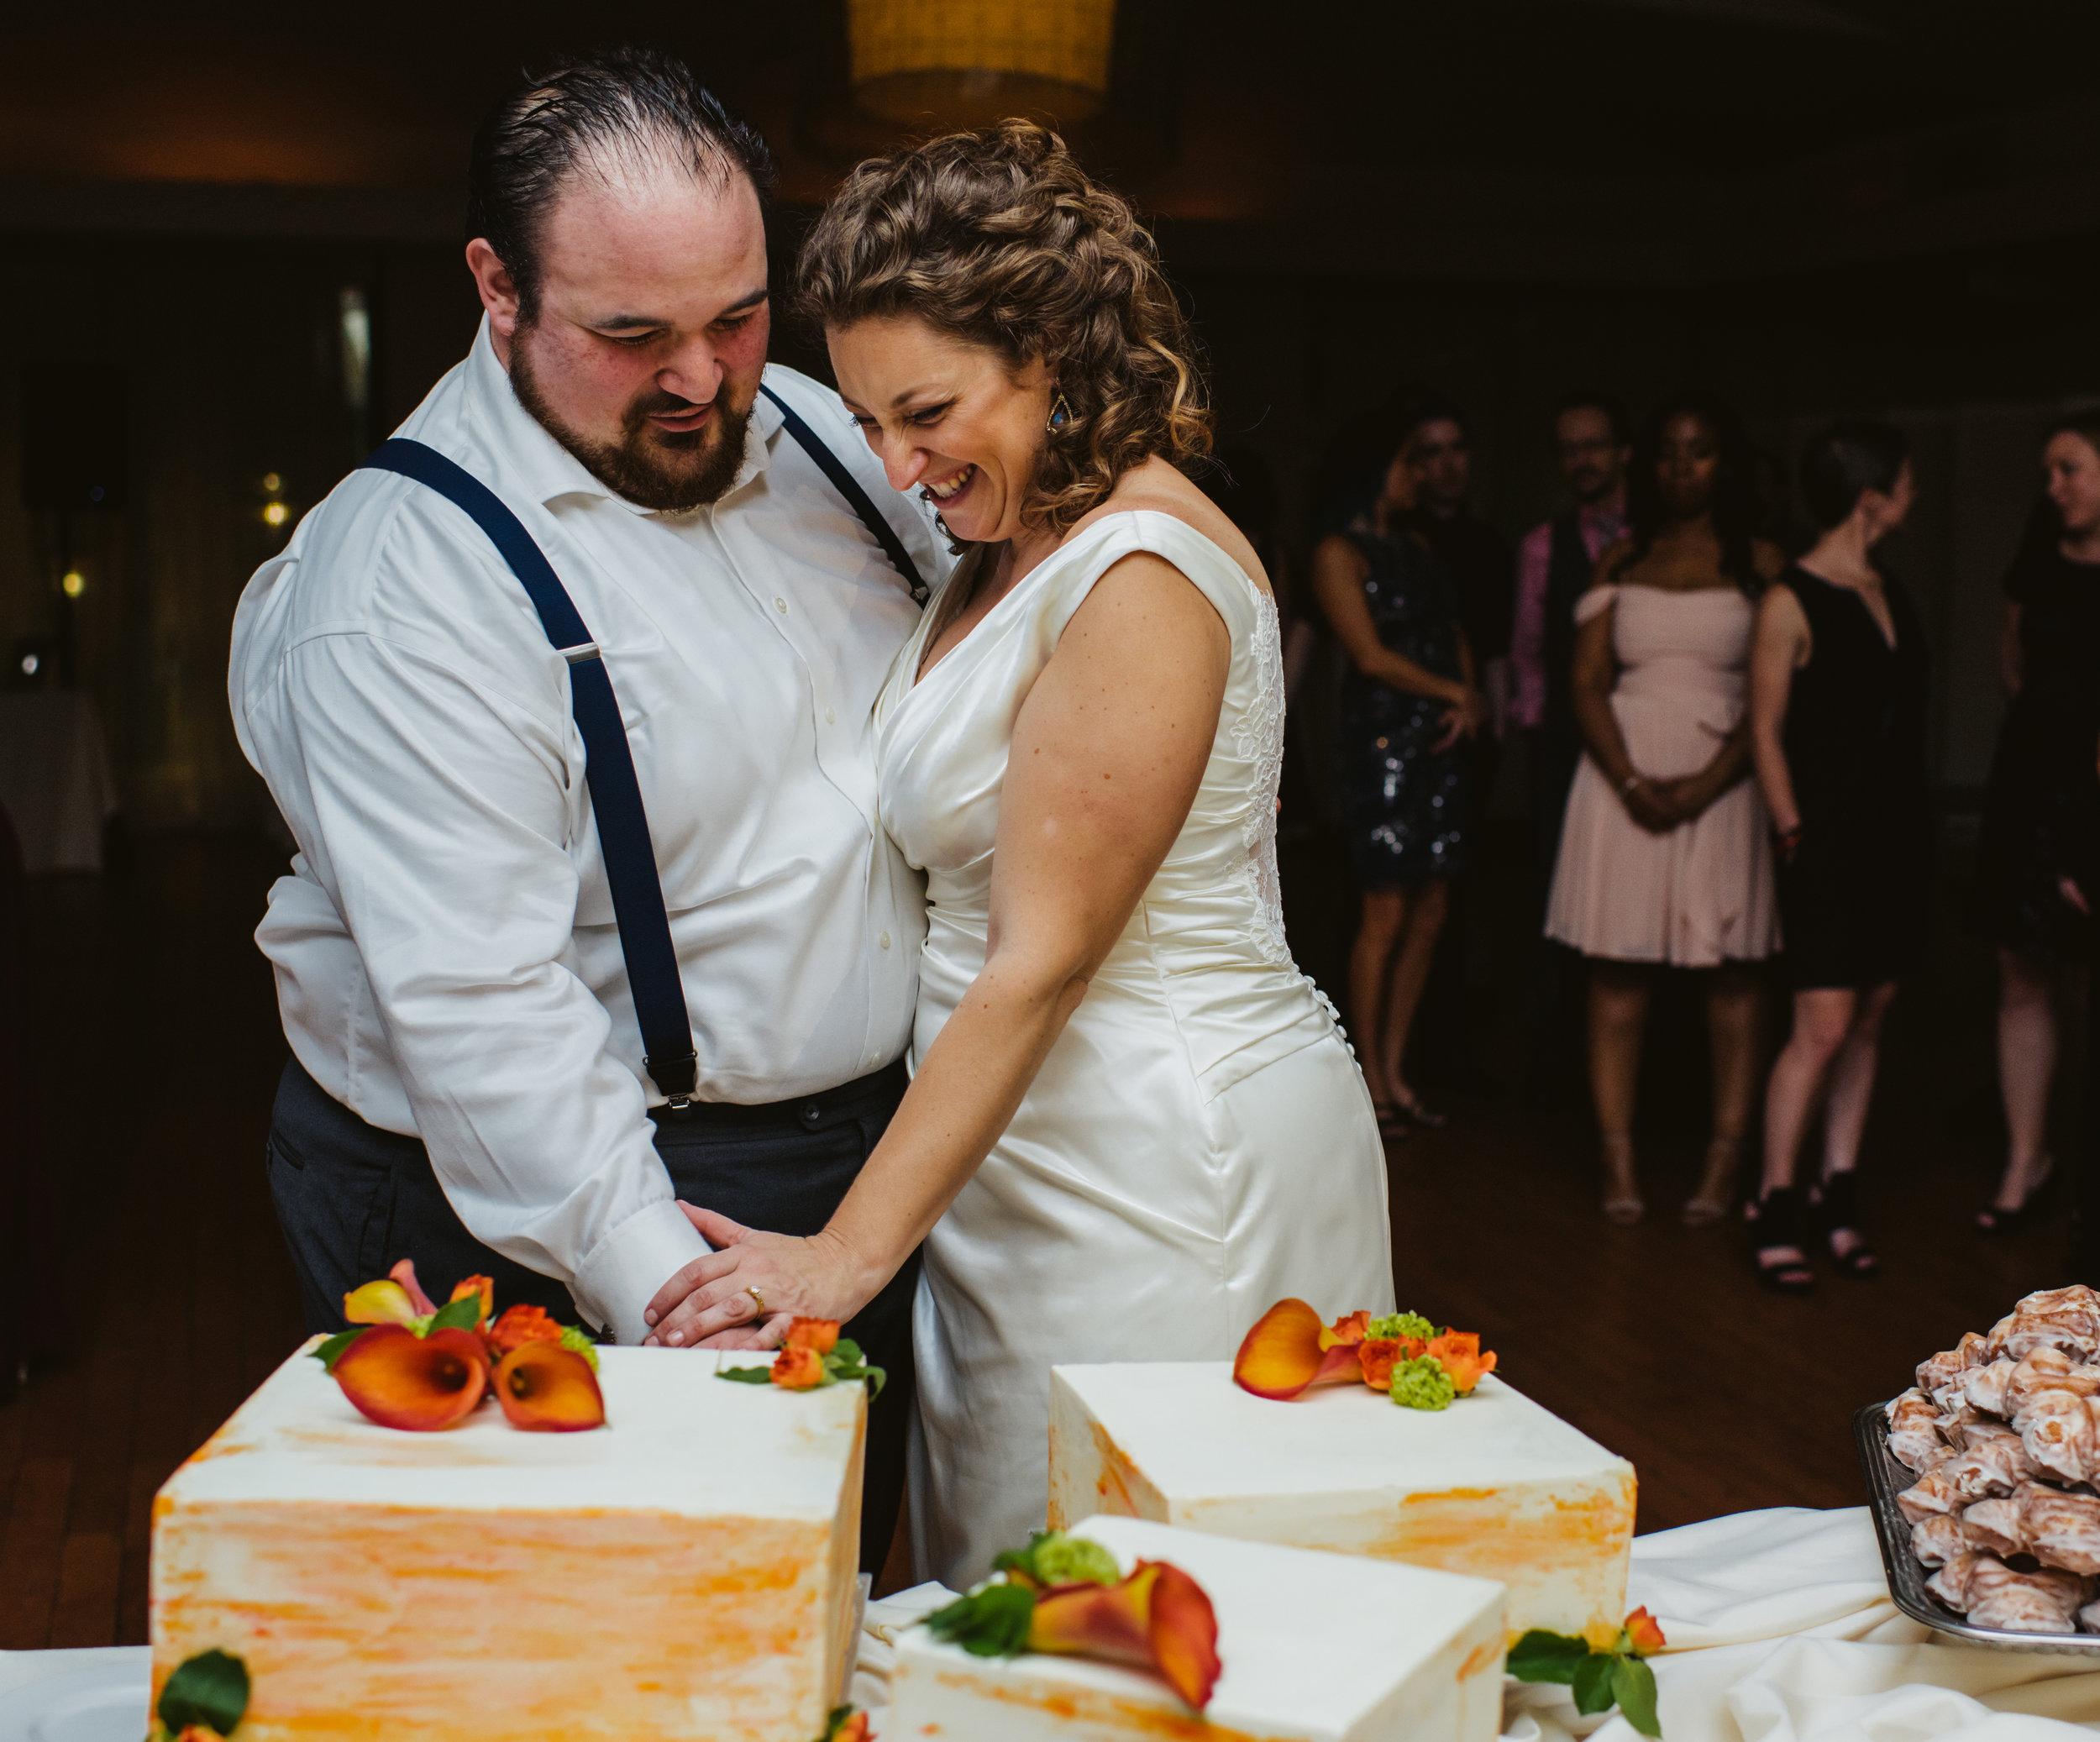 LIZA & JON - BATTERY PARK WEDDING - NYC INTIMATE WEDDING PHOTOGRAPHER - CHI-CHI AGBIM-875.jpg